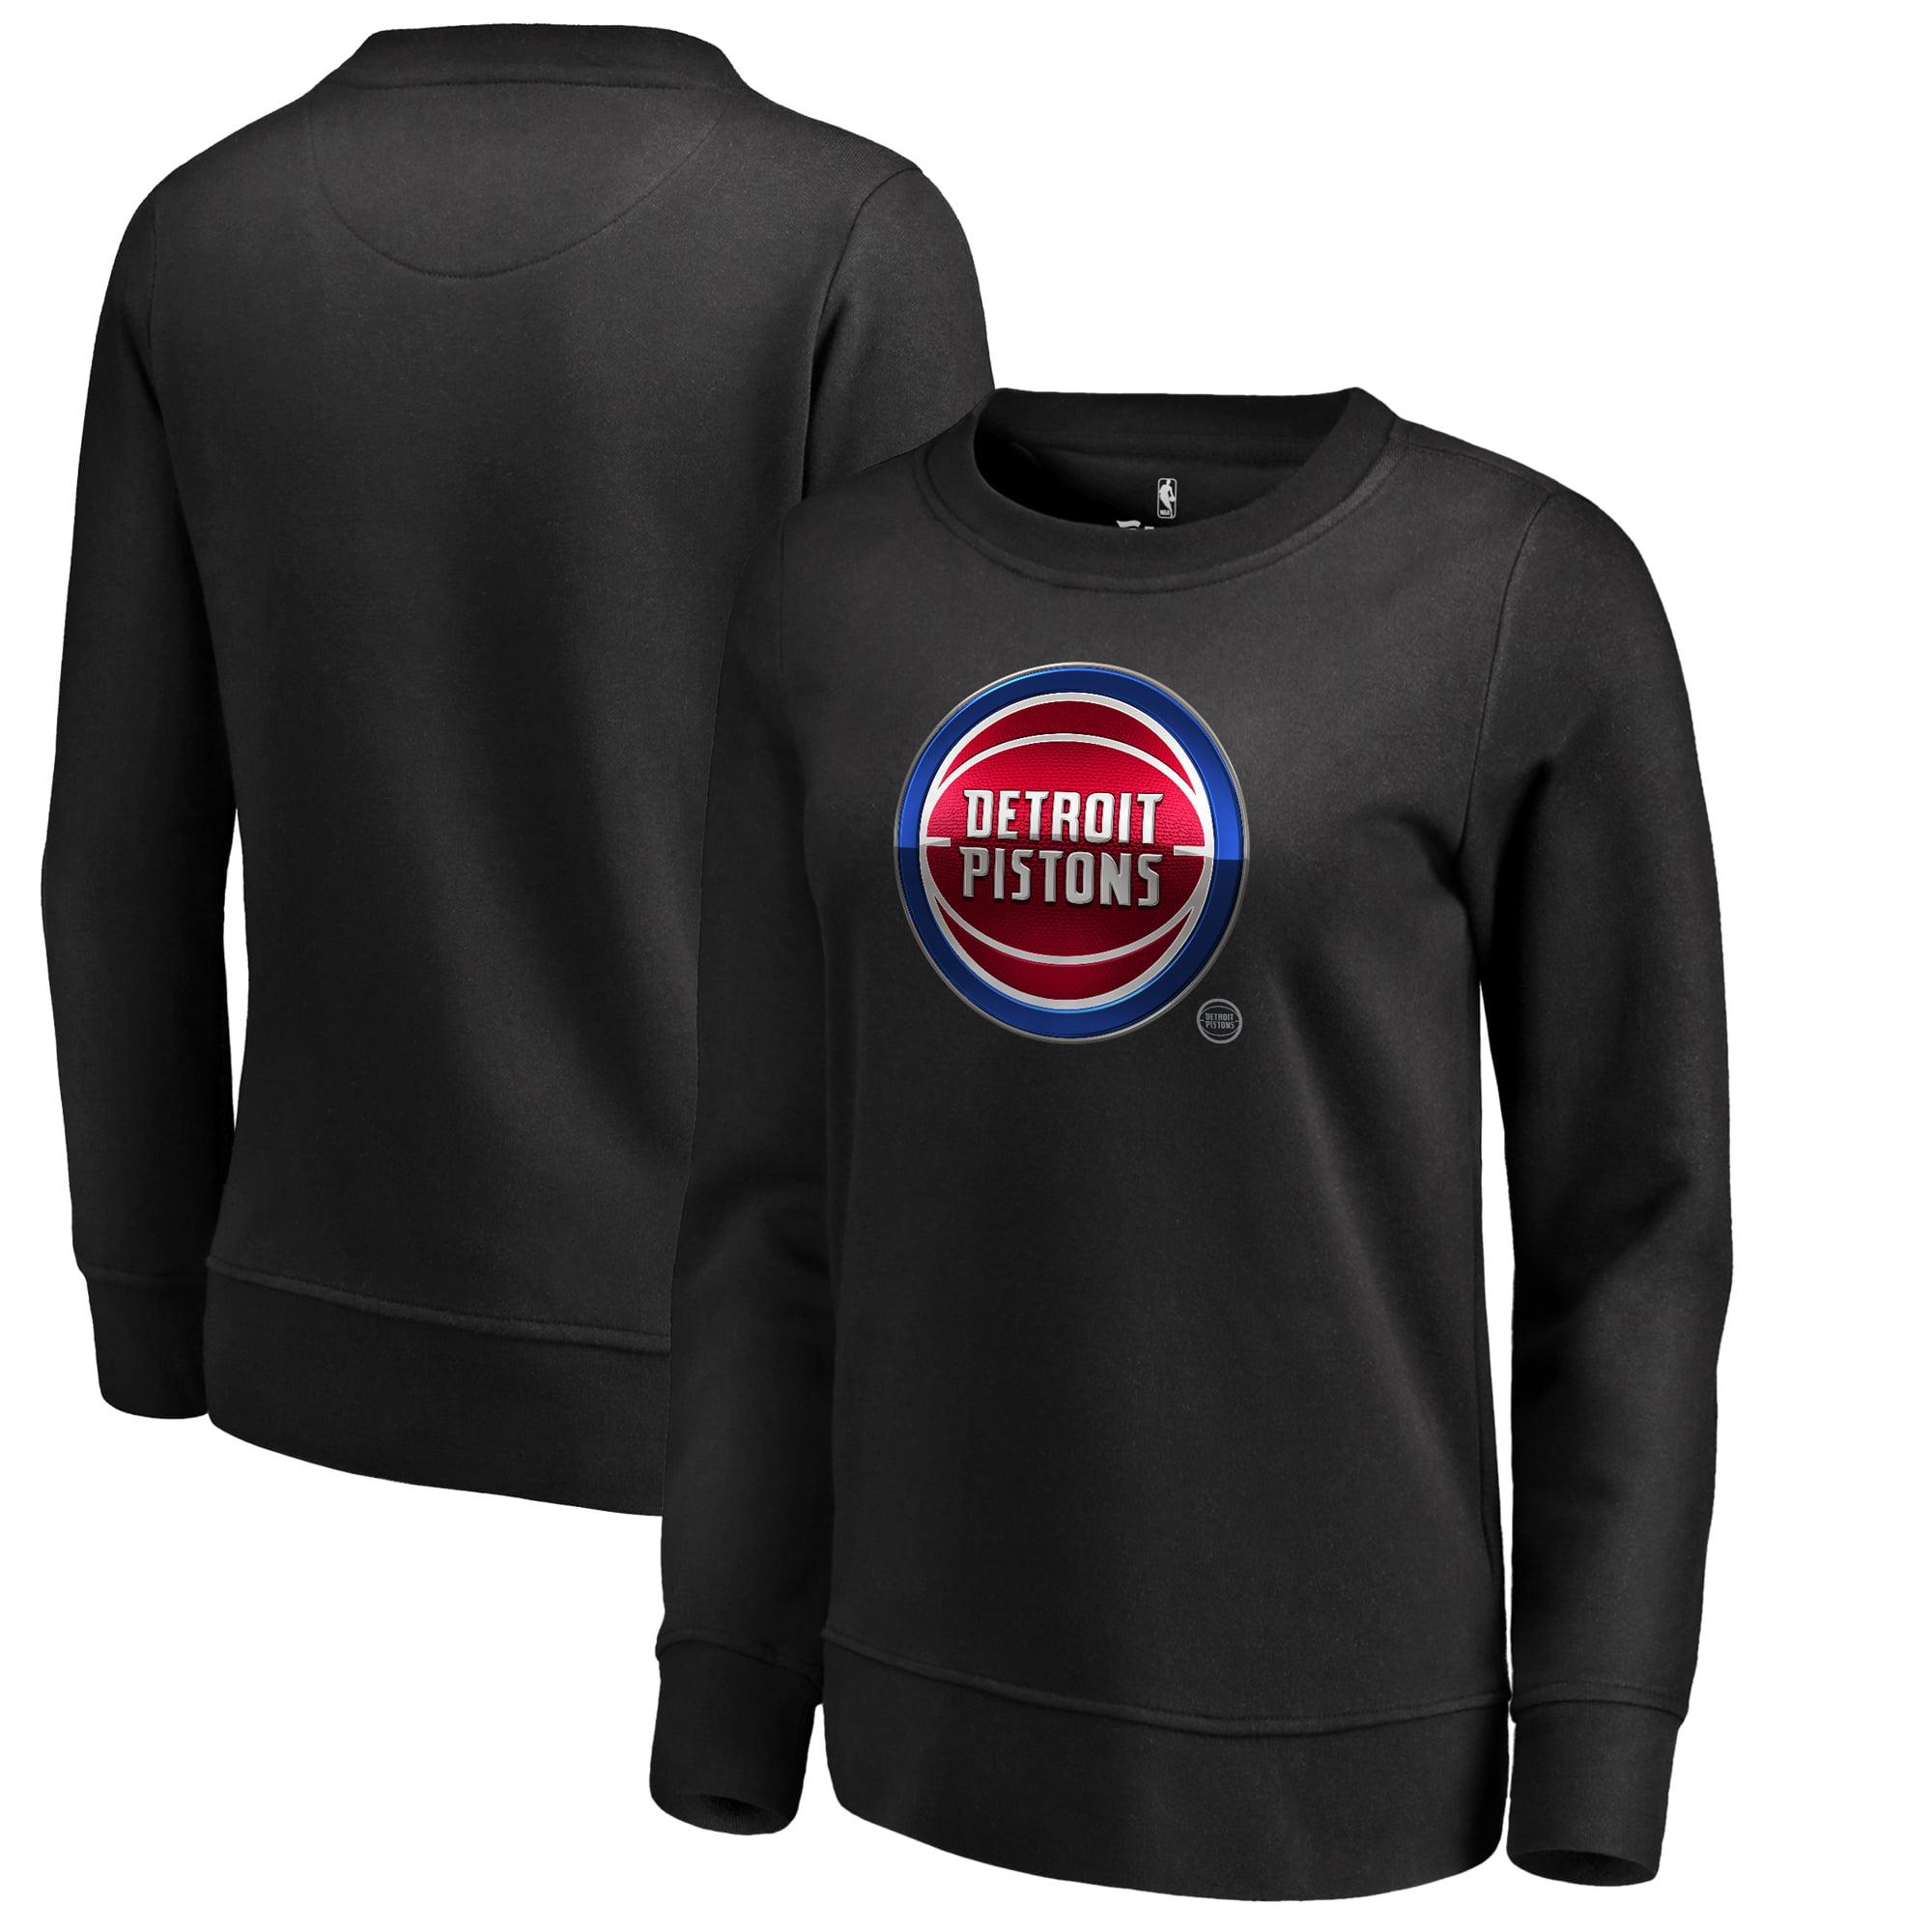 Detroit Pistons Fanatics Branded Women's Midnight Mascot Pullover Sweatshirt - Black